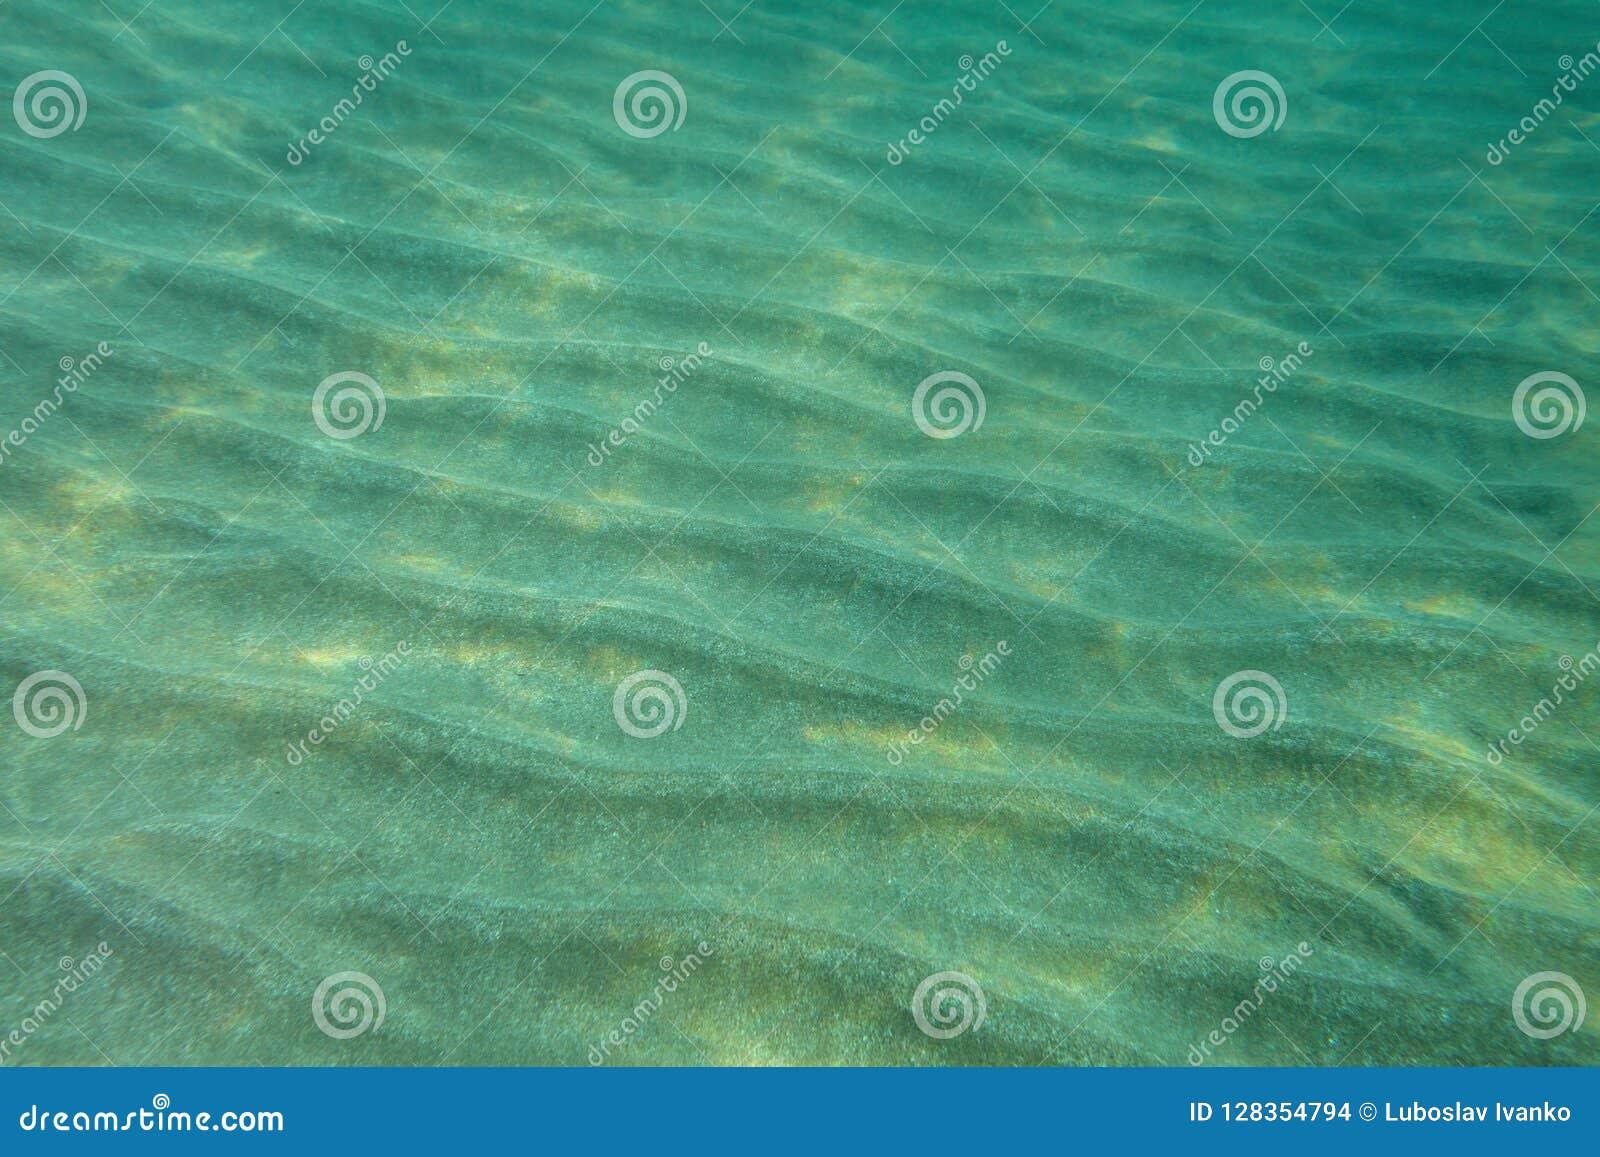 Meeresgrundunterwasserfoto,